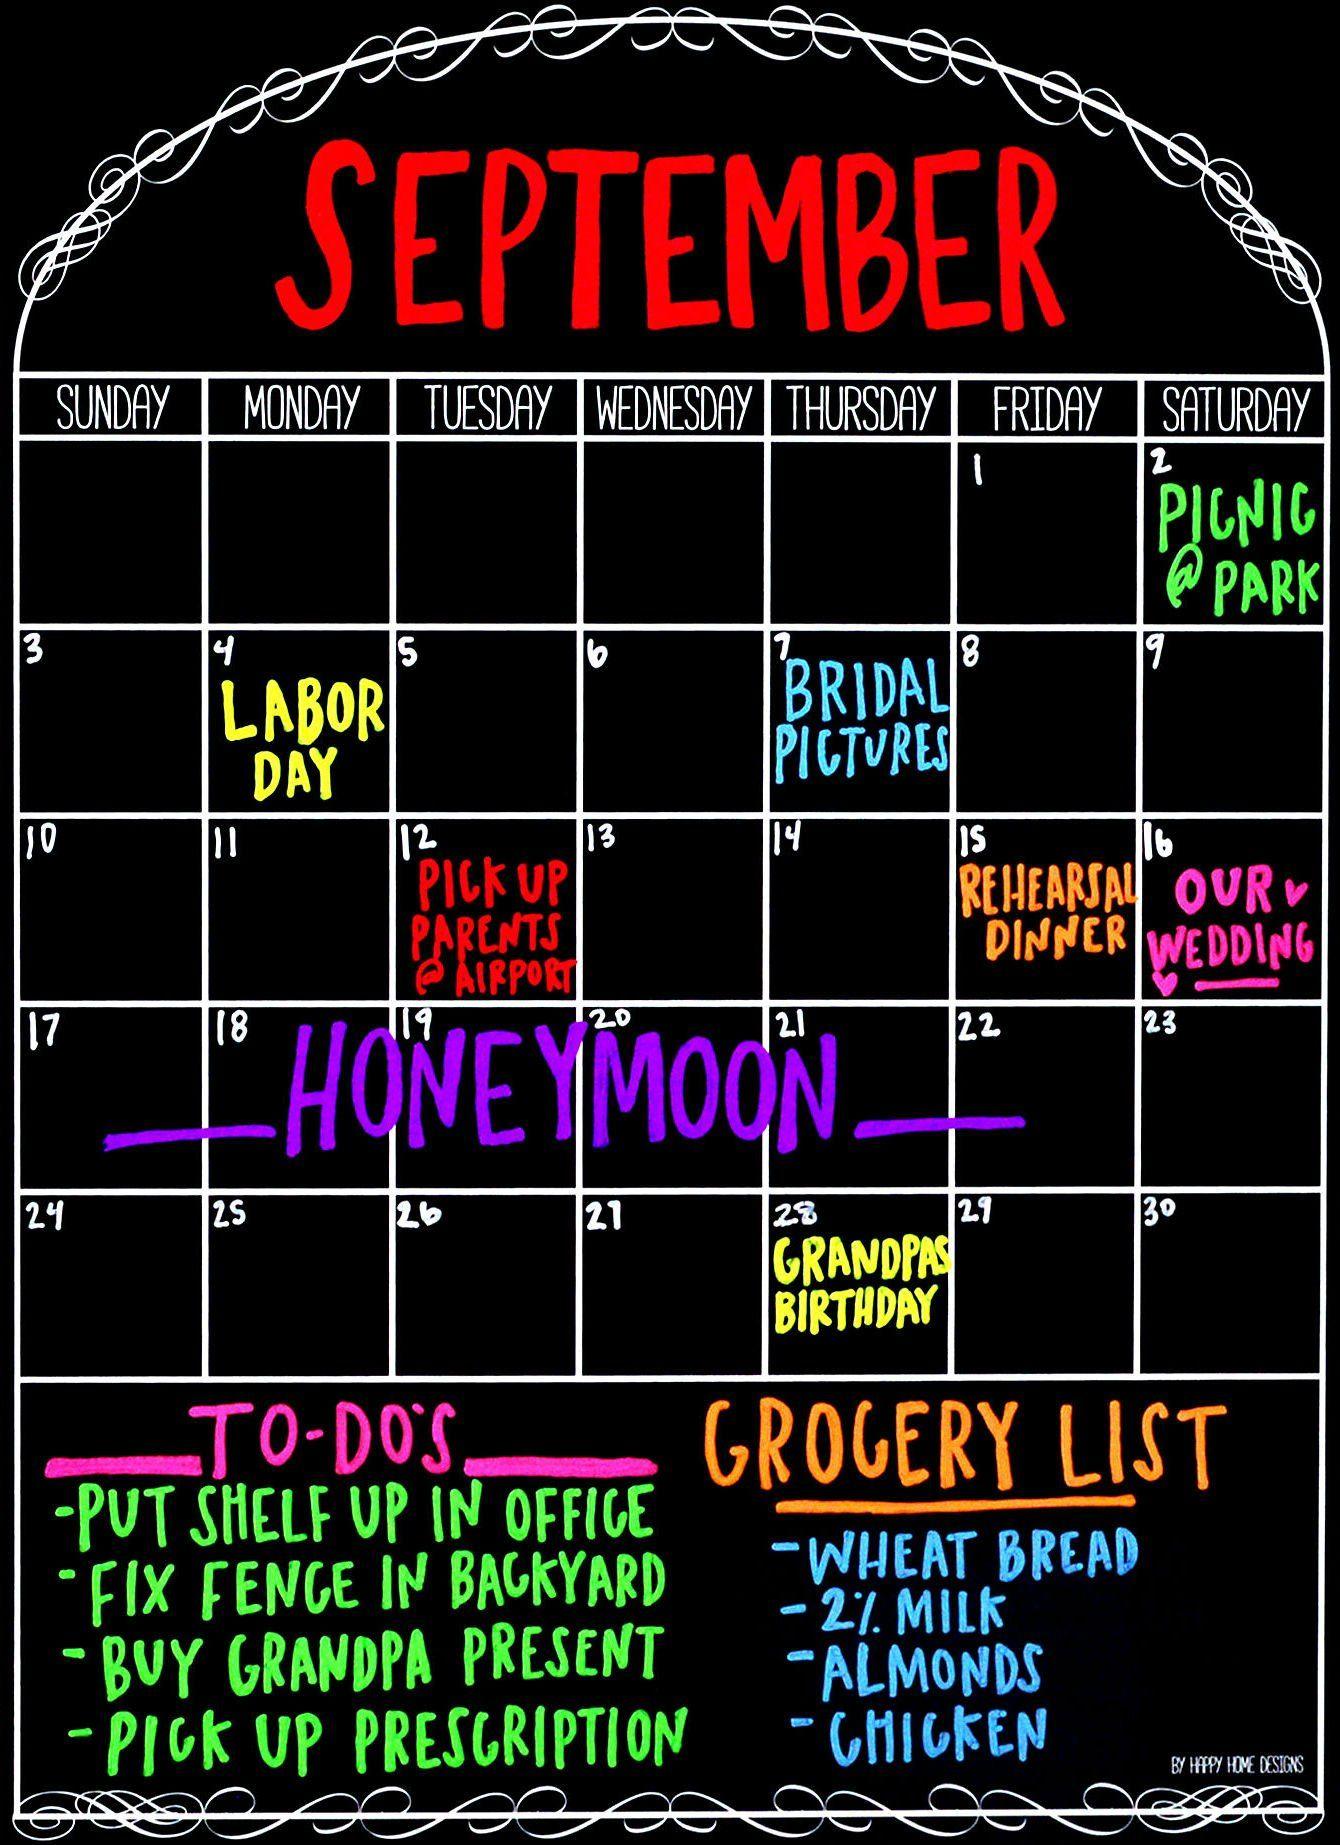 Magnetic Monthly Calendar For Refrigerator : Refrigerator magnetic calendar monthly dry erase whiteboard